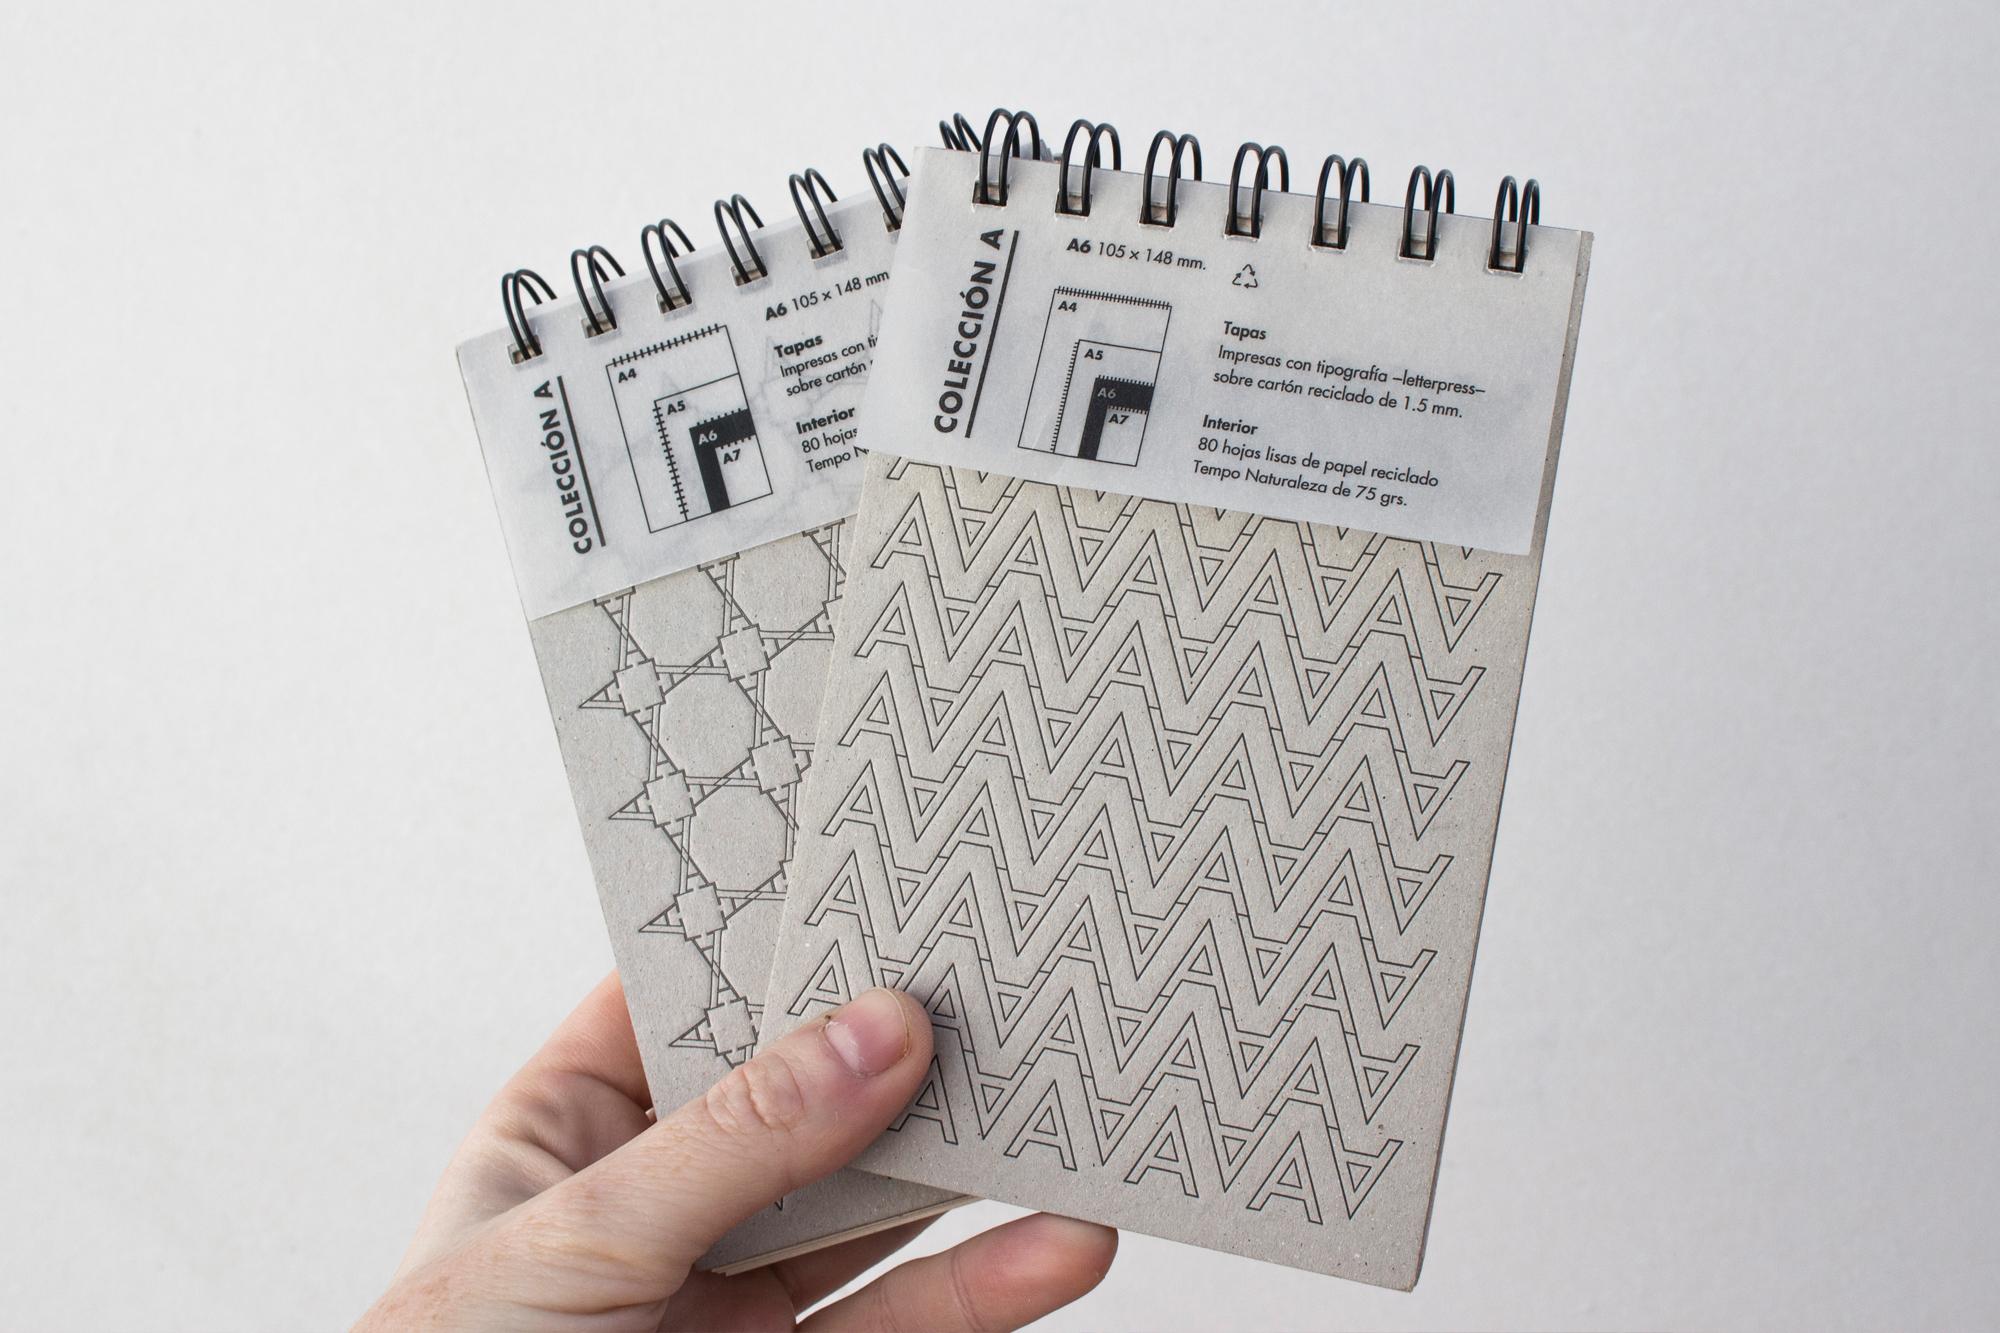 2-anotador-a6-coleccion-colecciona-papel-principal-letterpress-imprenta-tipografica-1.jpg